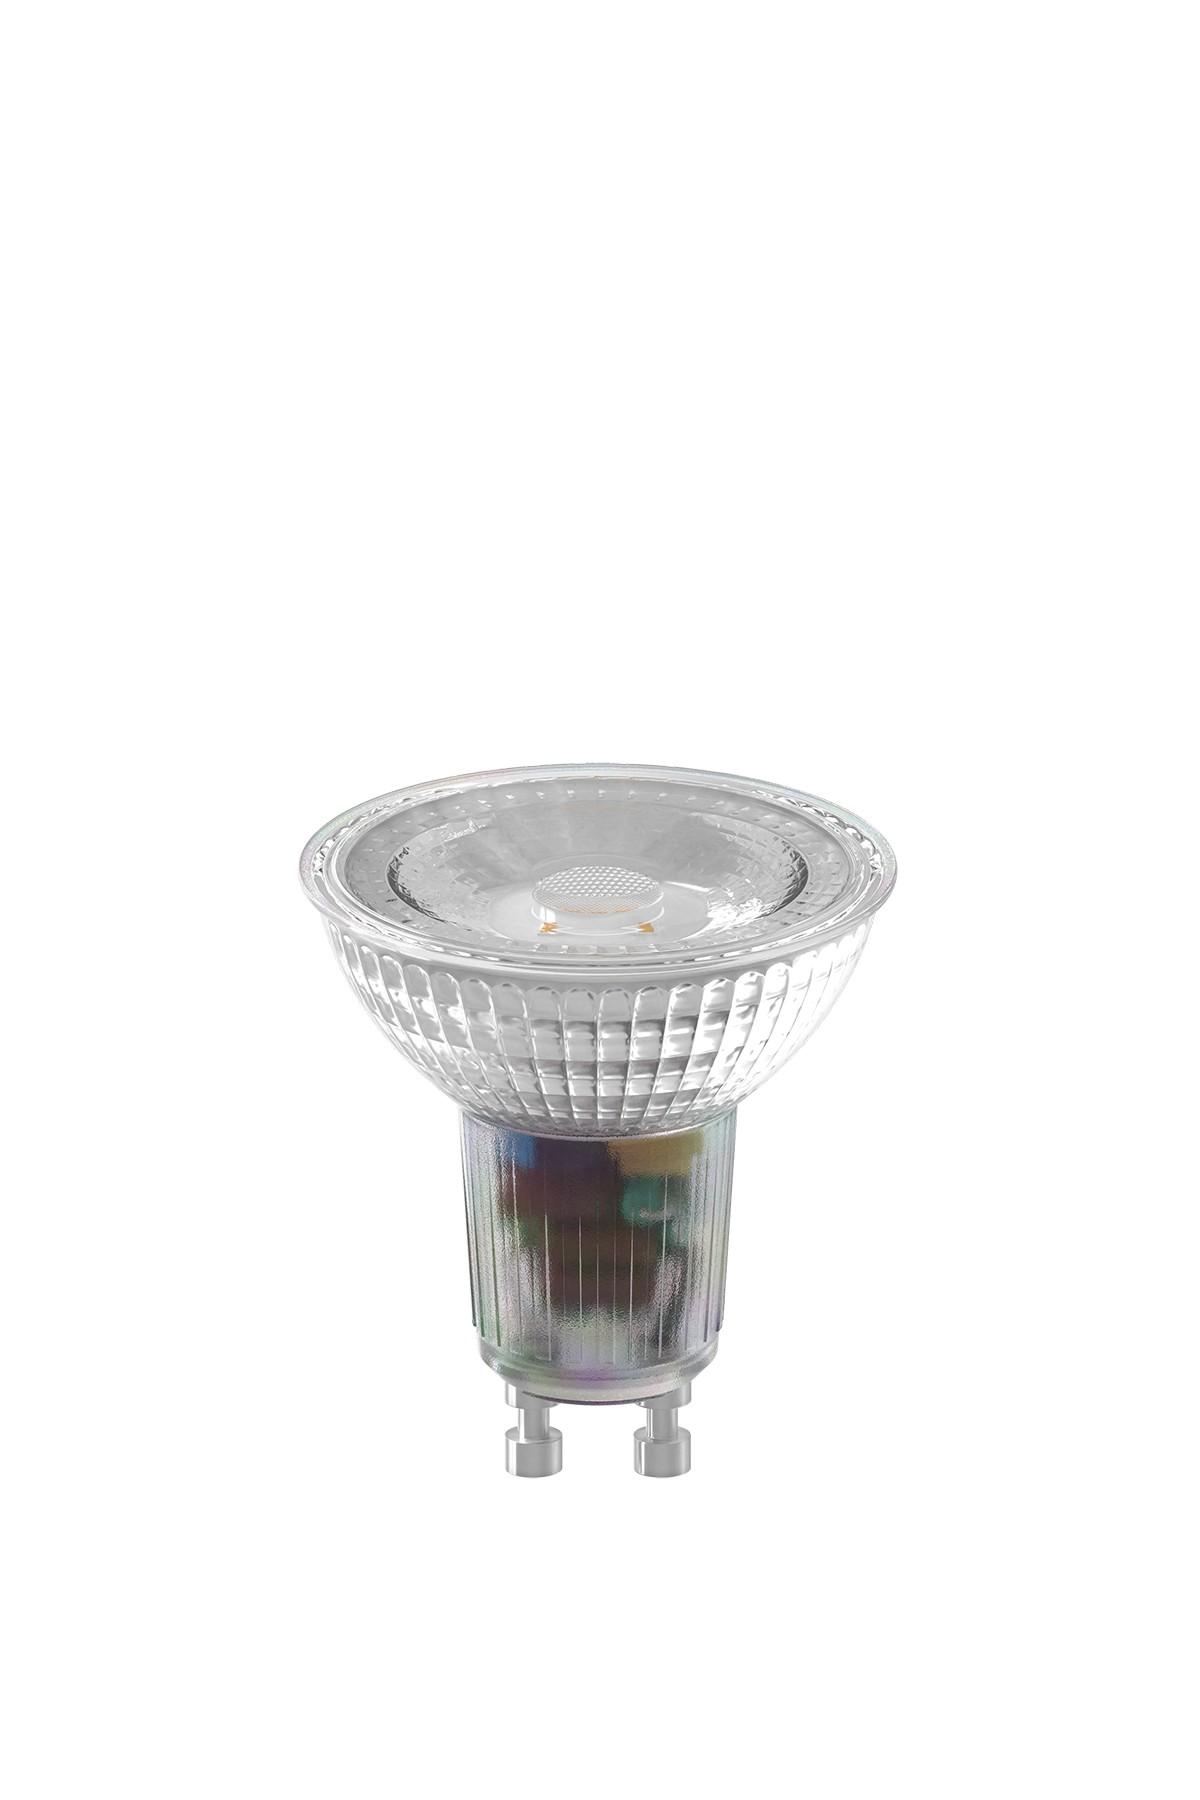 Calex SMD LED lamp GU10 240V 5,5W 420lm 2000-2700K Variotone ...